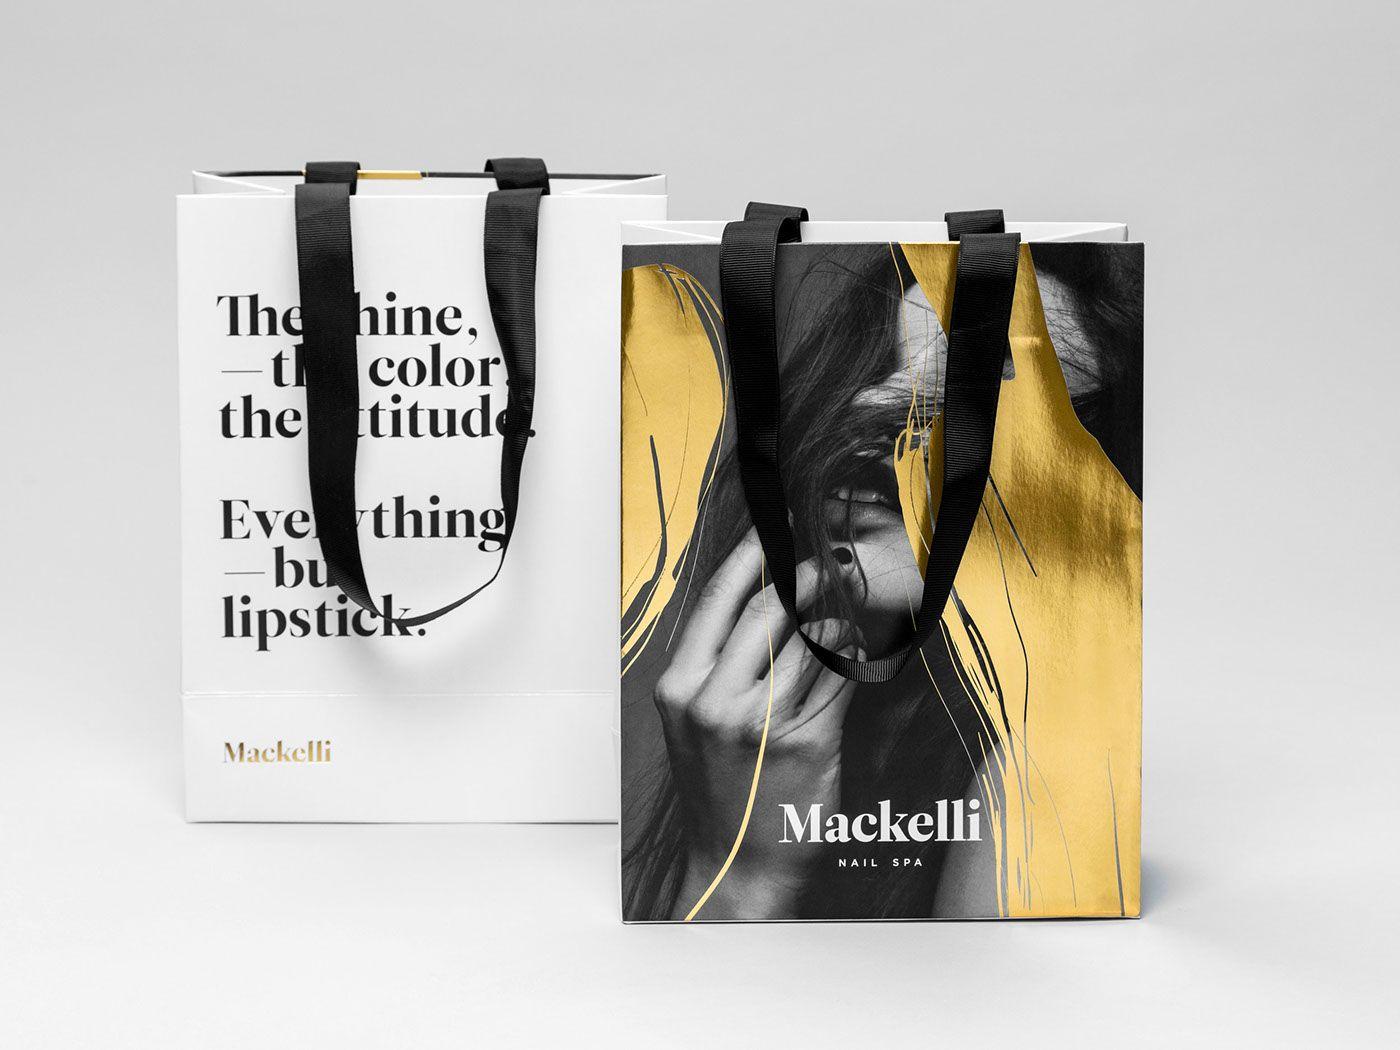 Mackelli by La Tortilleria